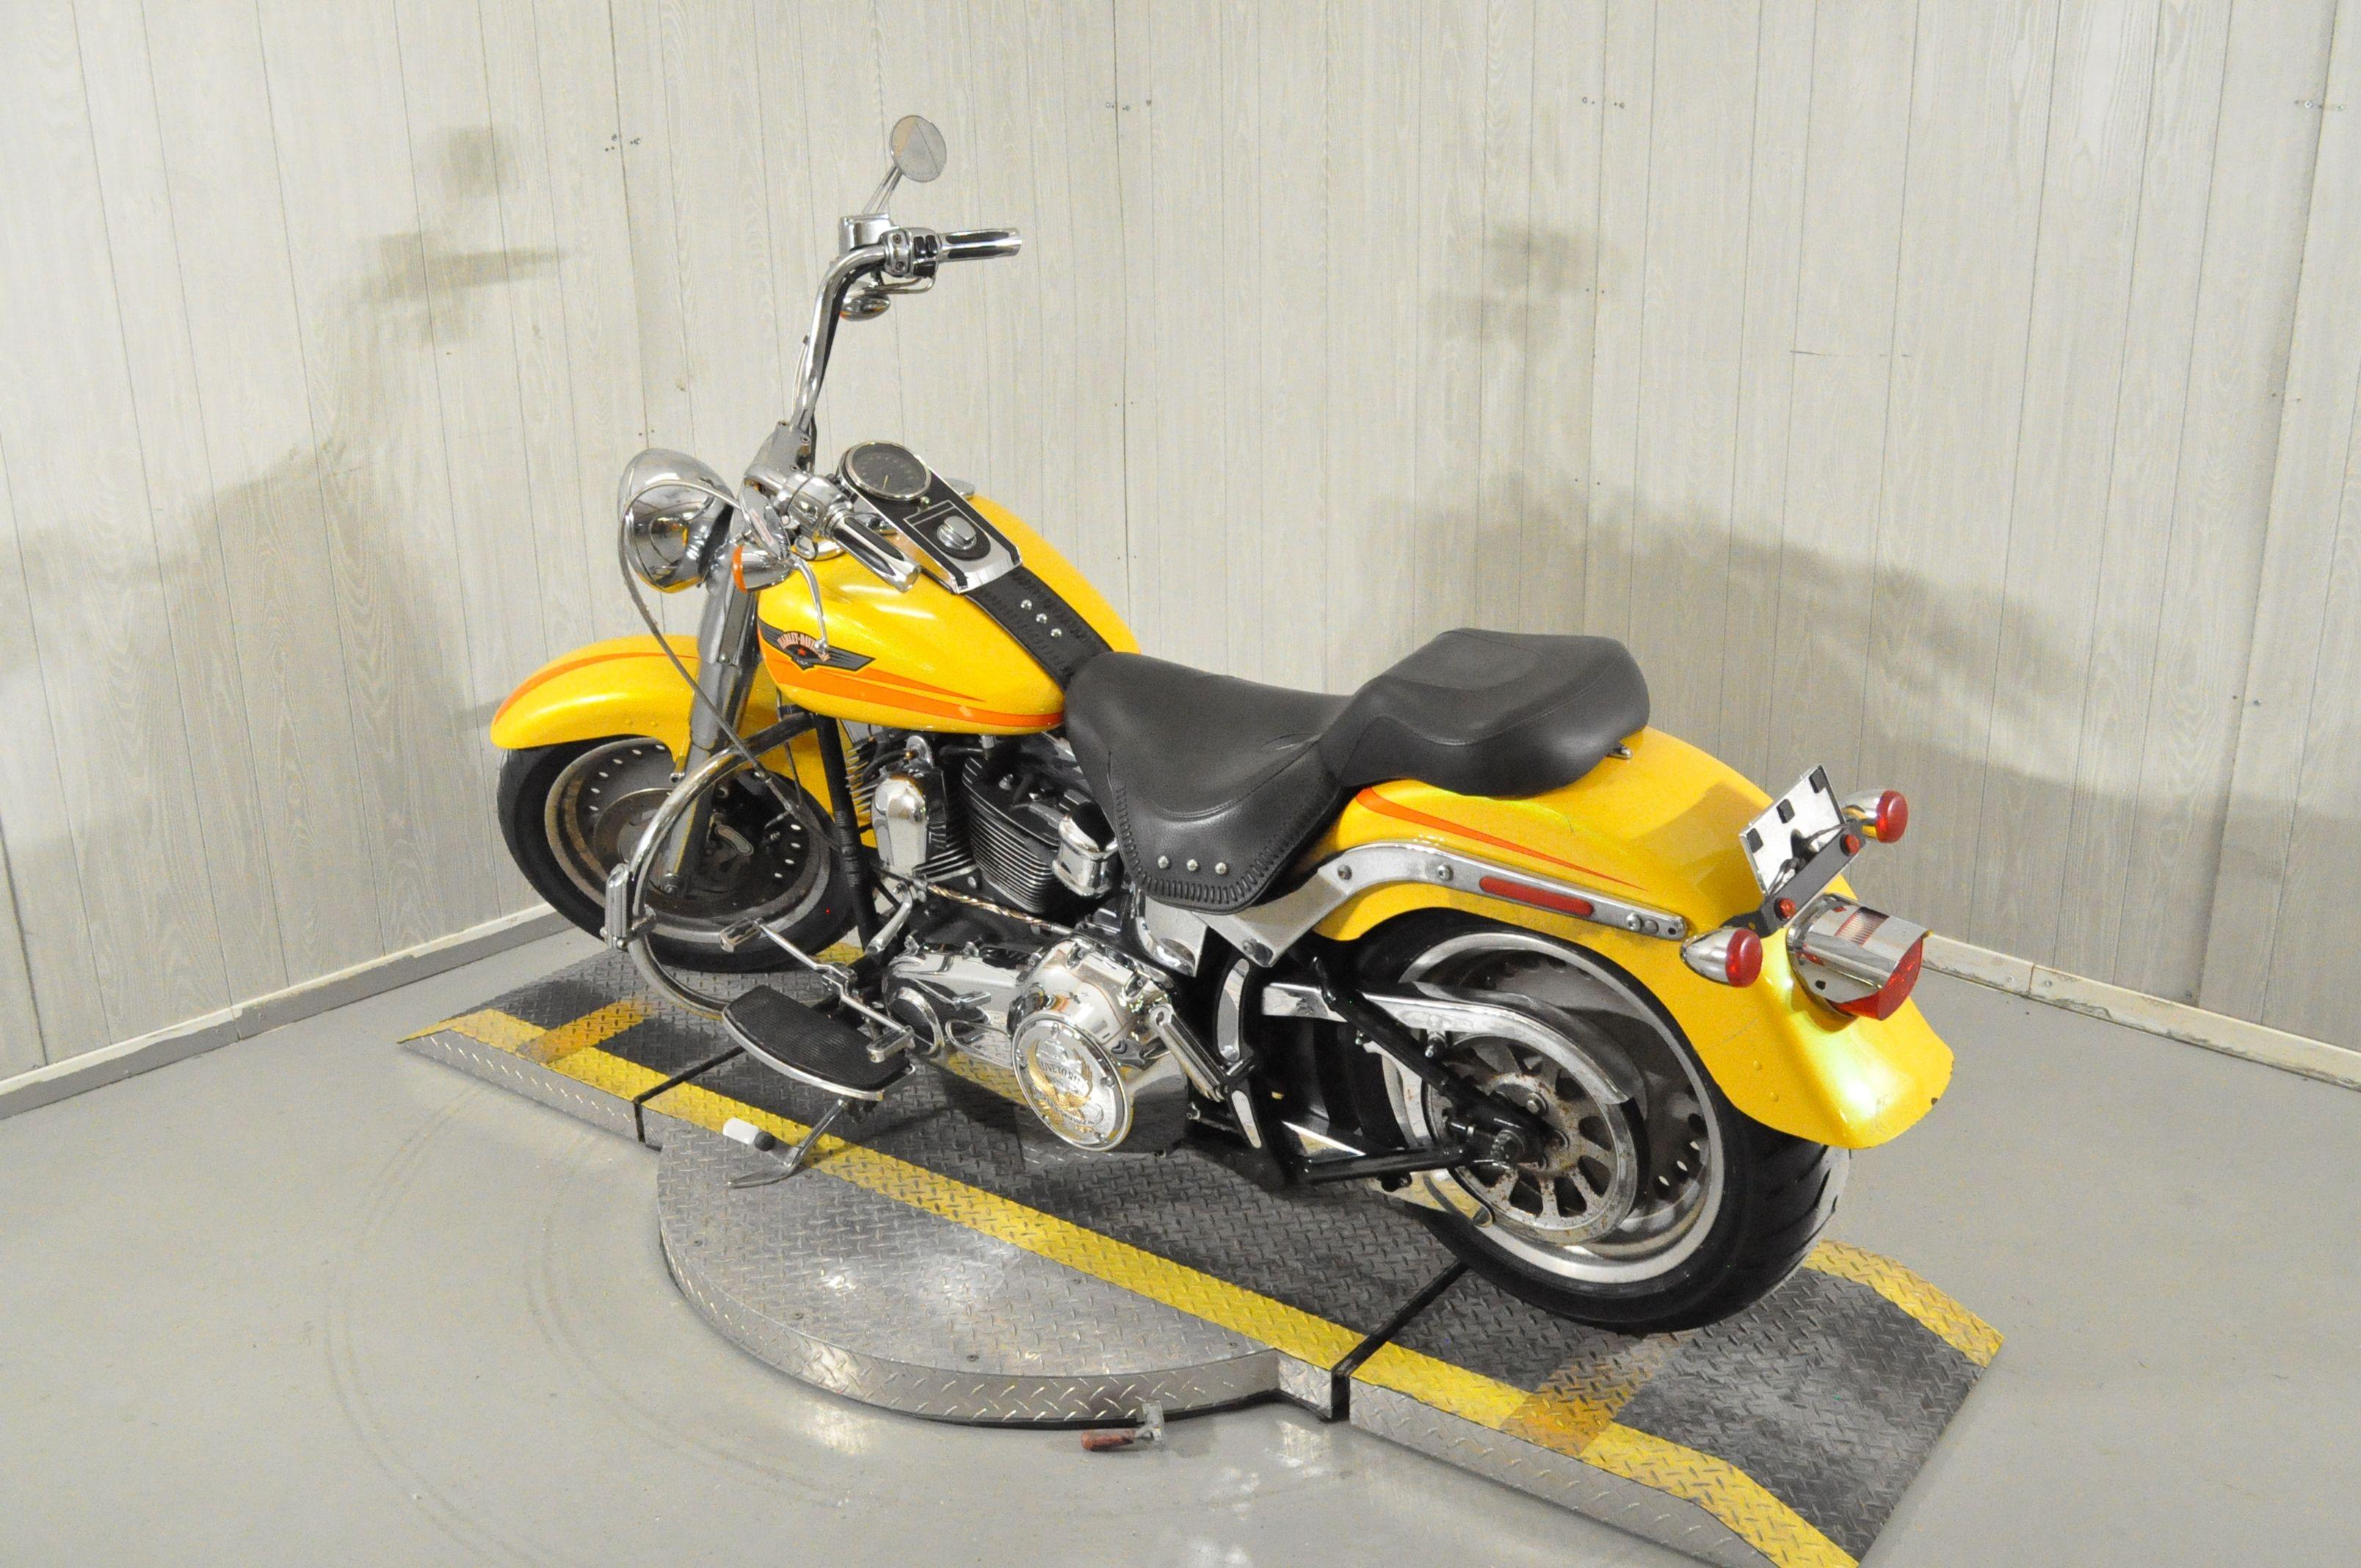 Pre-Owned 2007 Harley-Davidson Fat Boy FLSTF